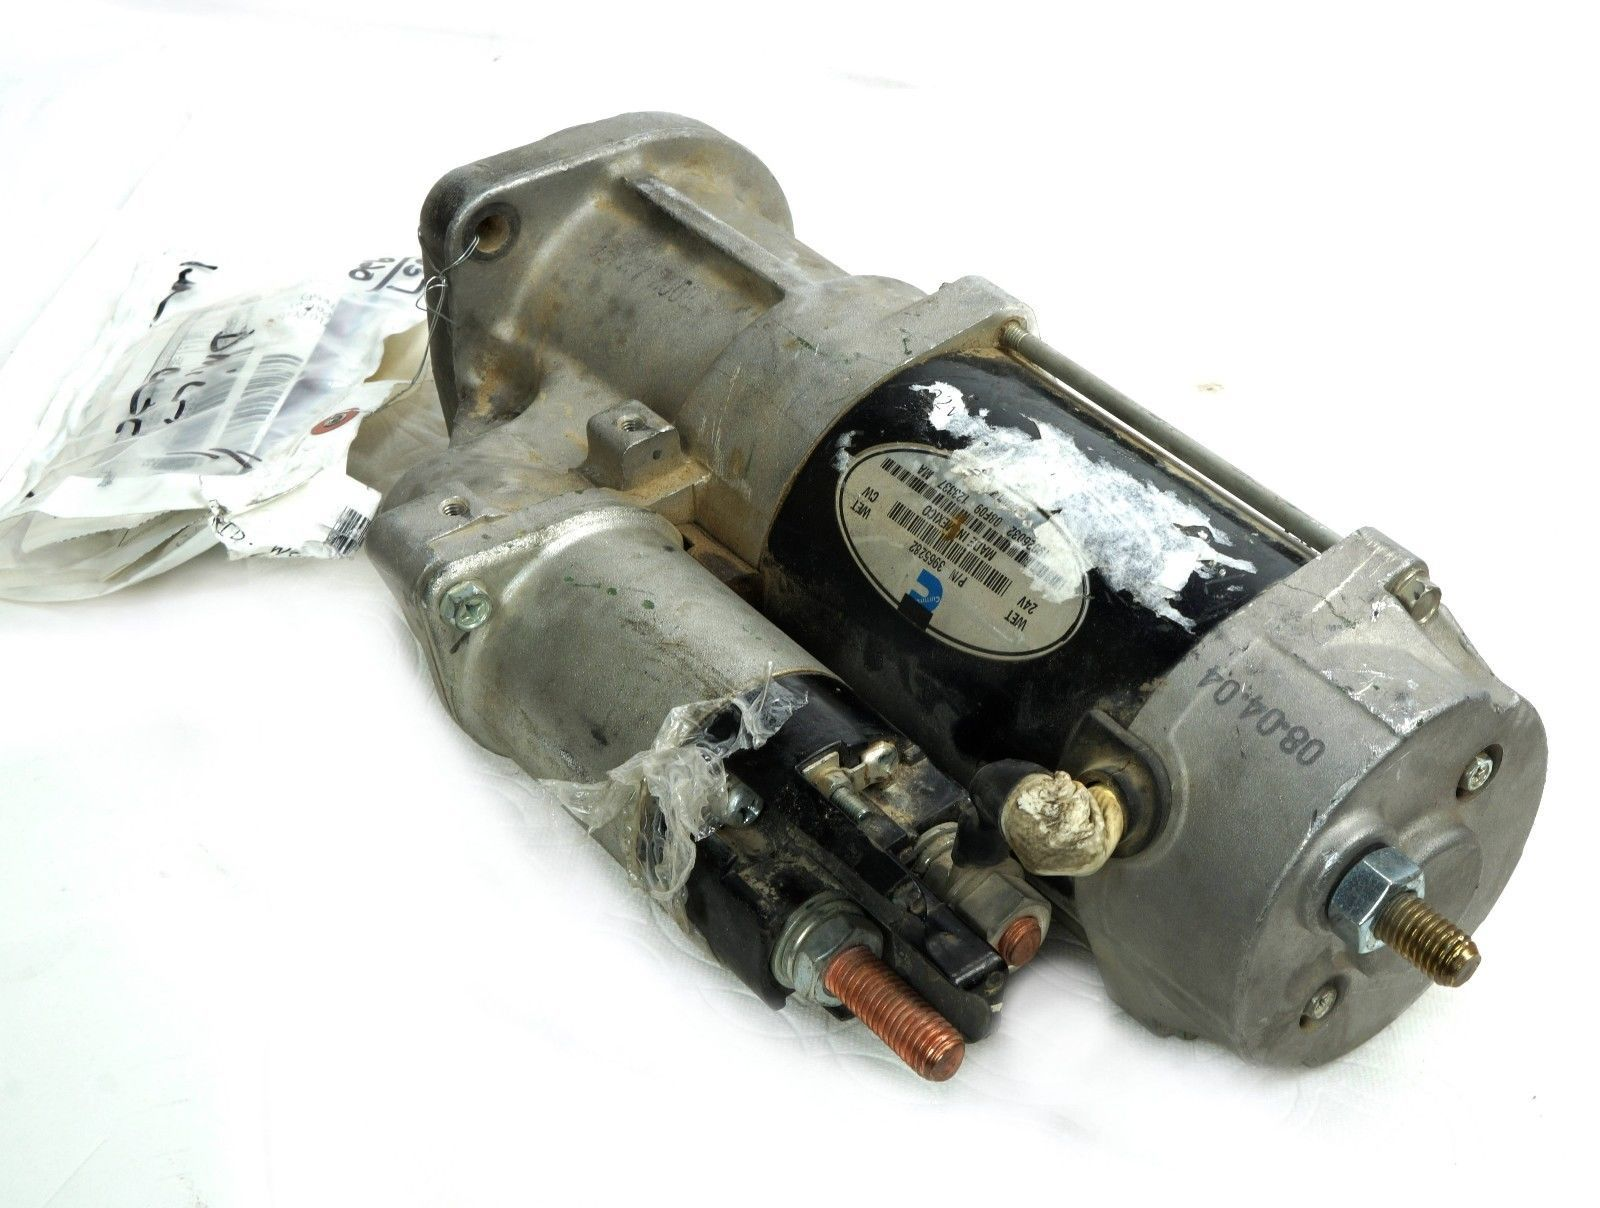 Cummins 3965282 Electrical Motor Starter 24V Fits Grove AT422T Crane ISB  Engines - $106.43